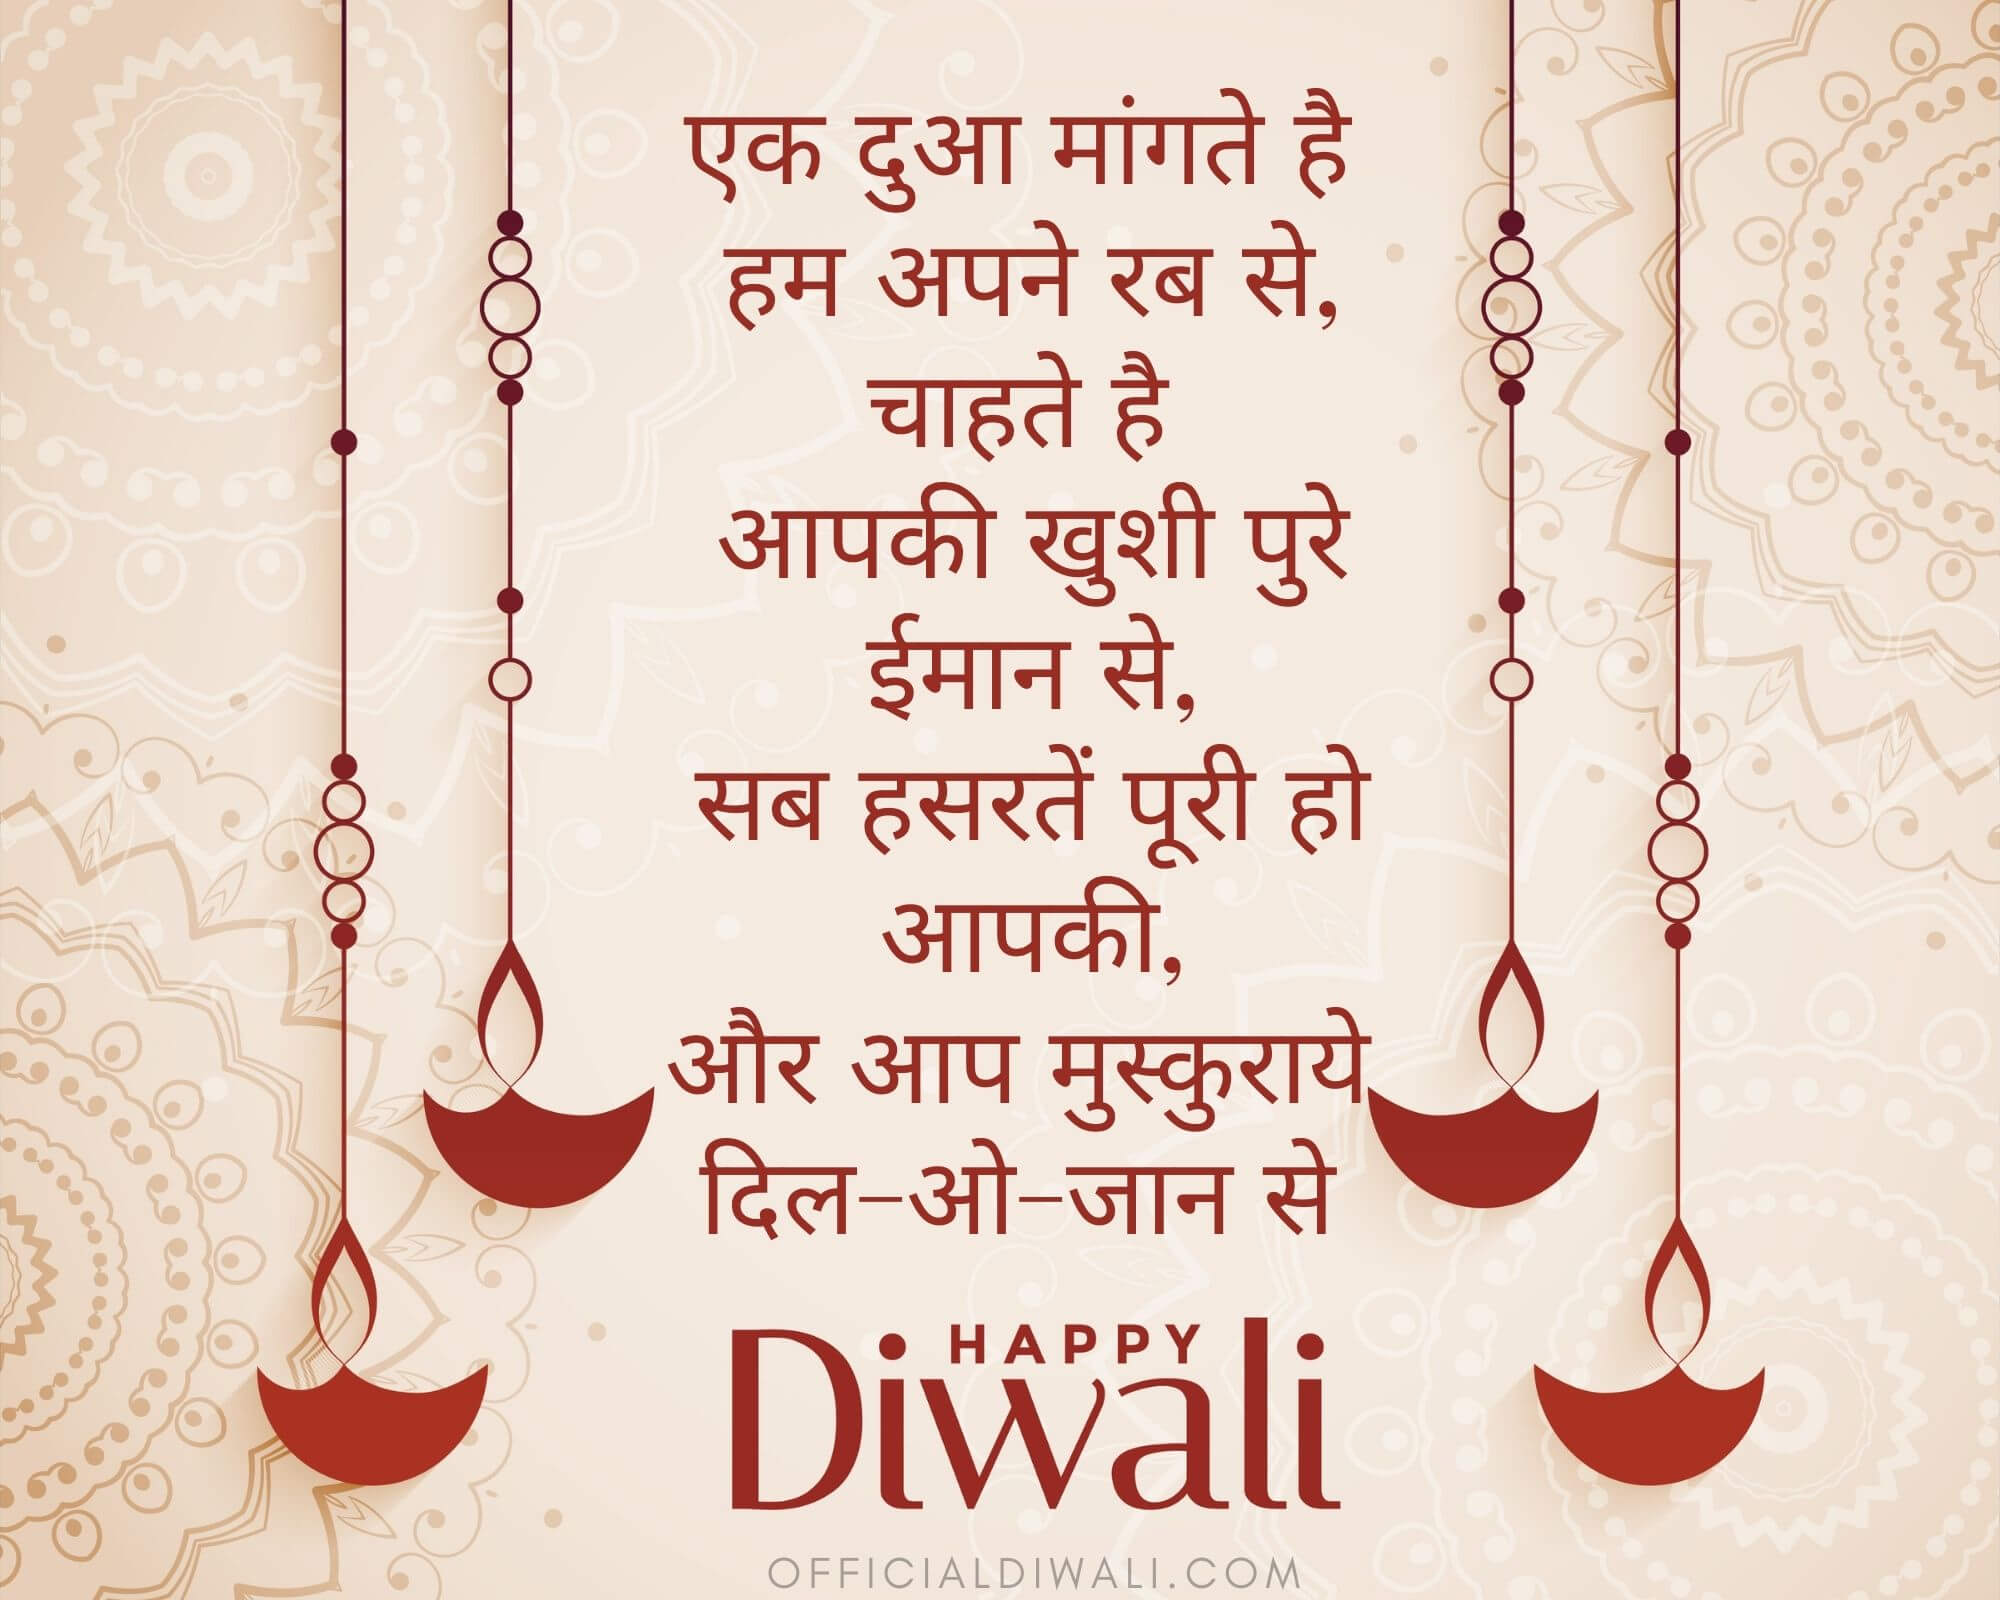 Happy Diwali papaji in hindi officialdiwali.com